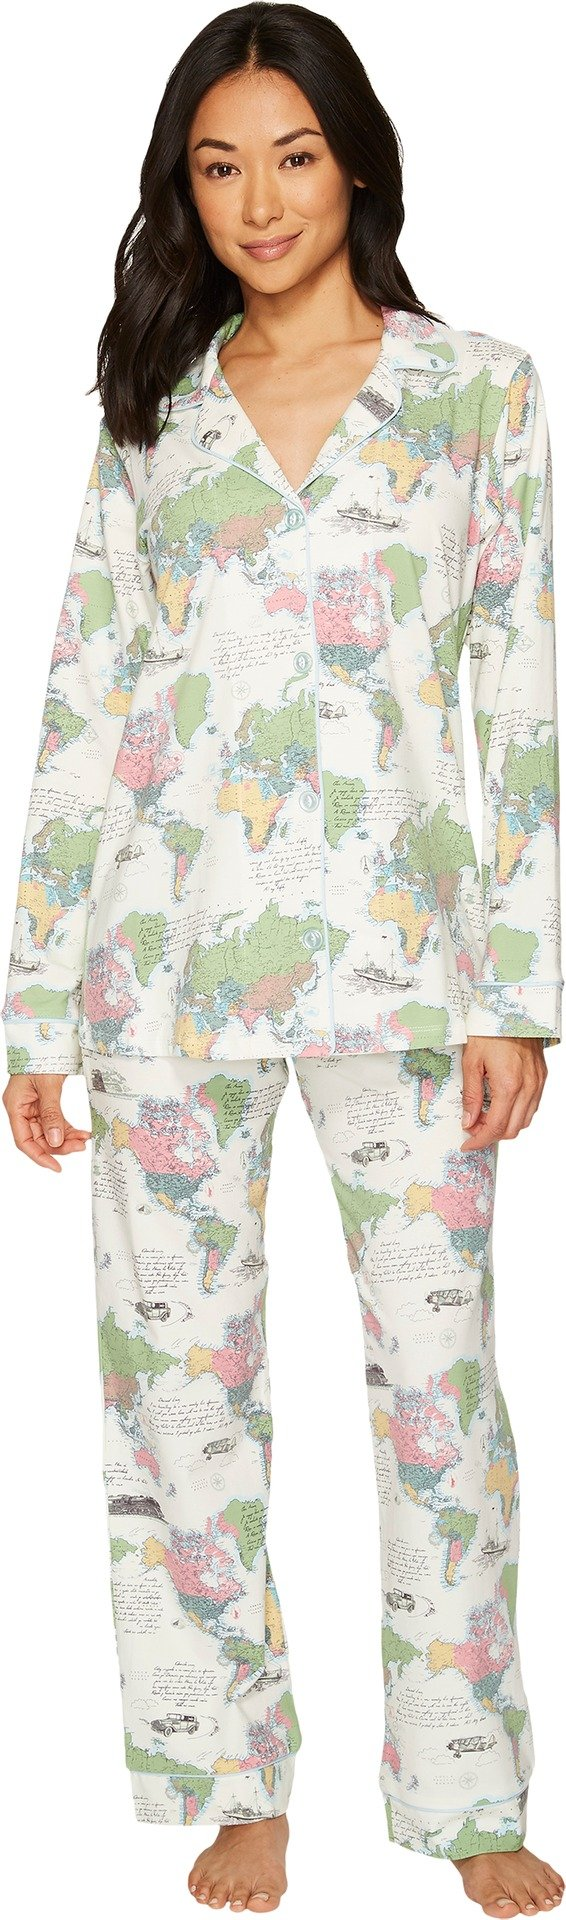 BedHead Women's Long Sleeve Classic Stretch Knit Pajama Set Travel Journal Medium